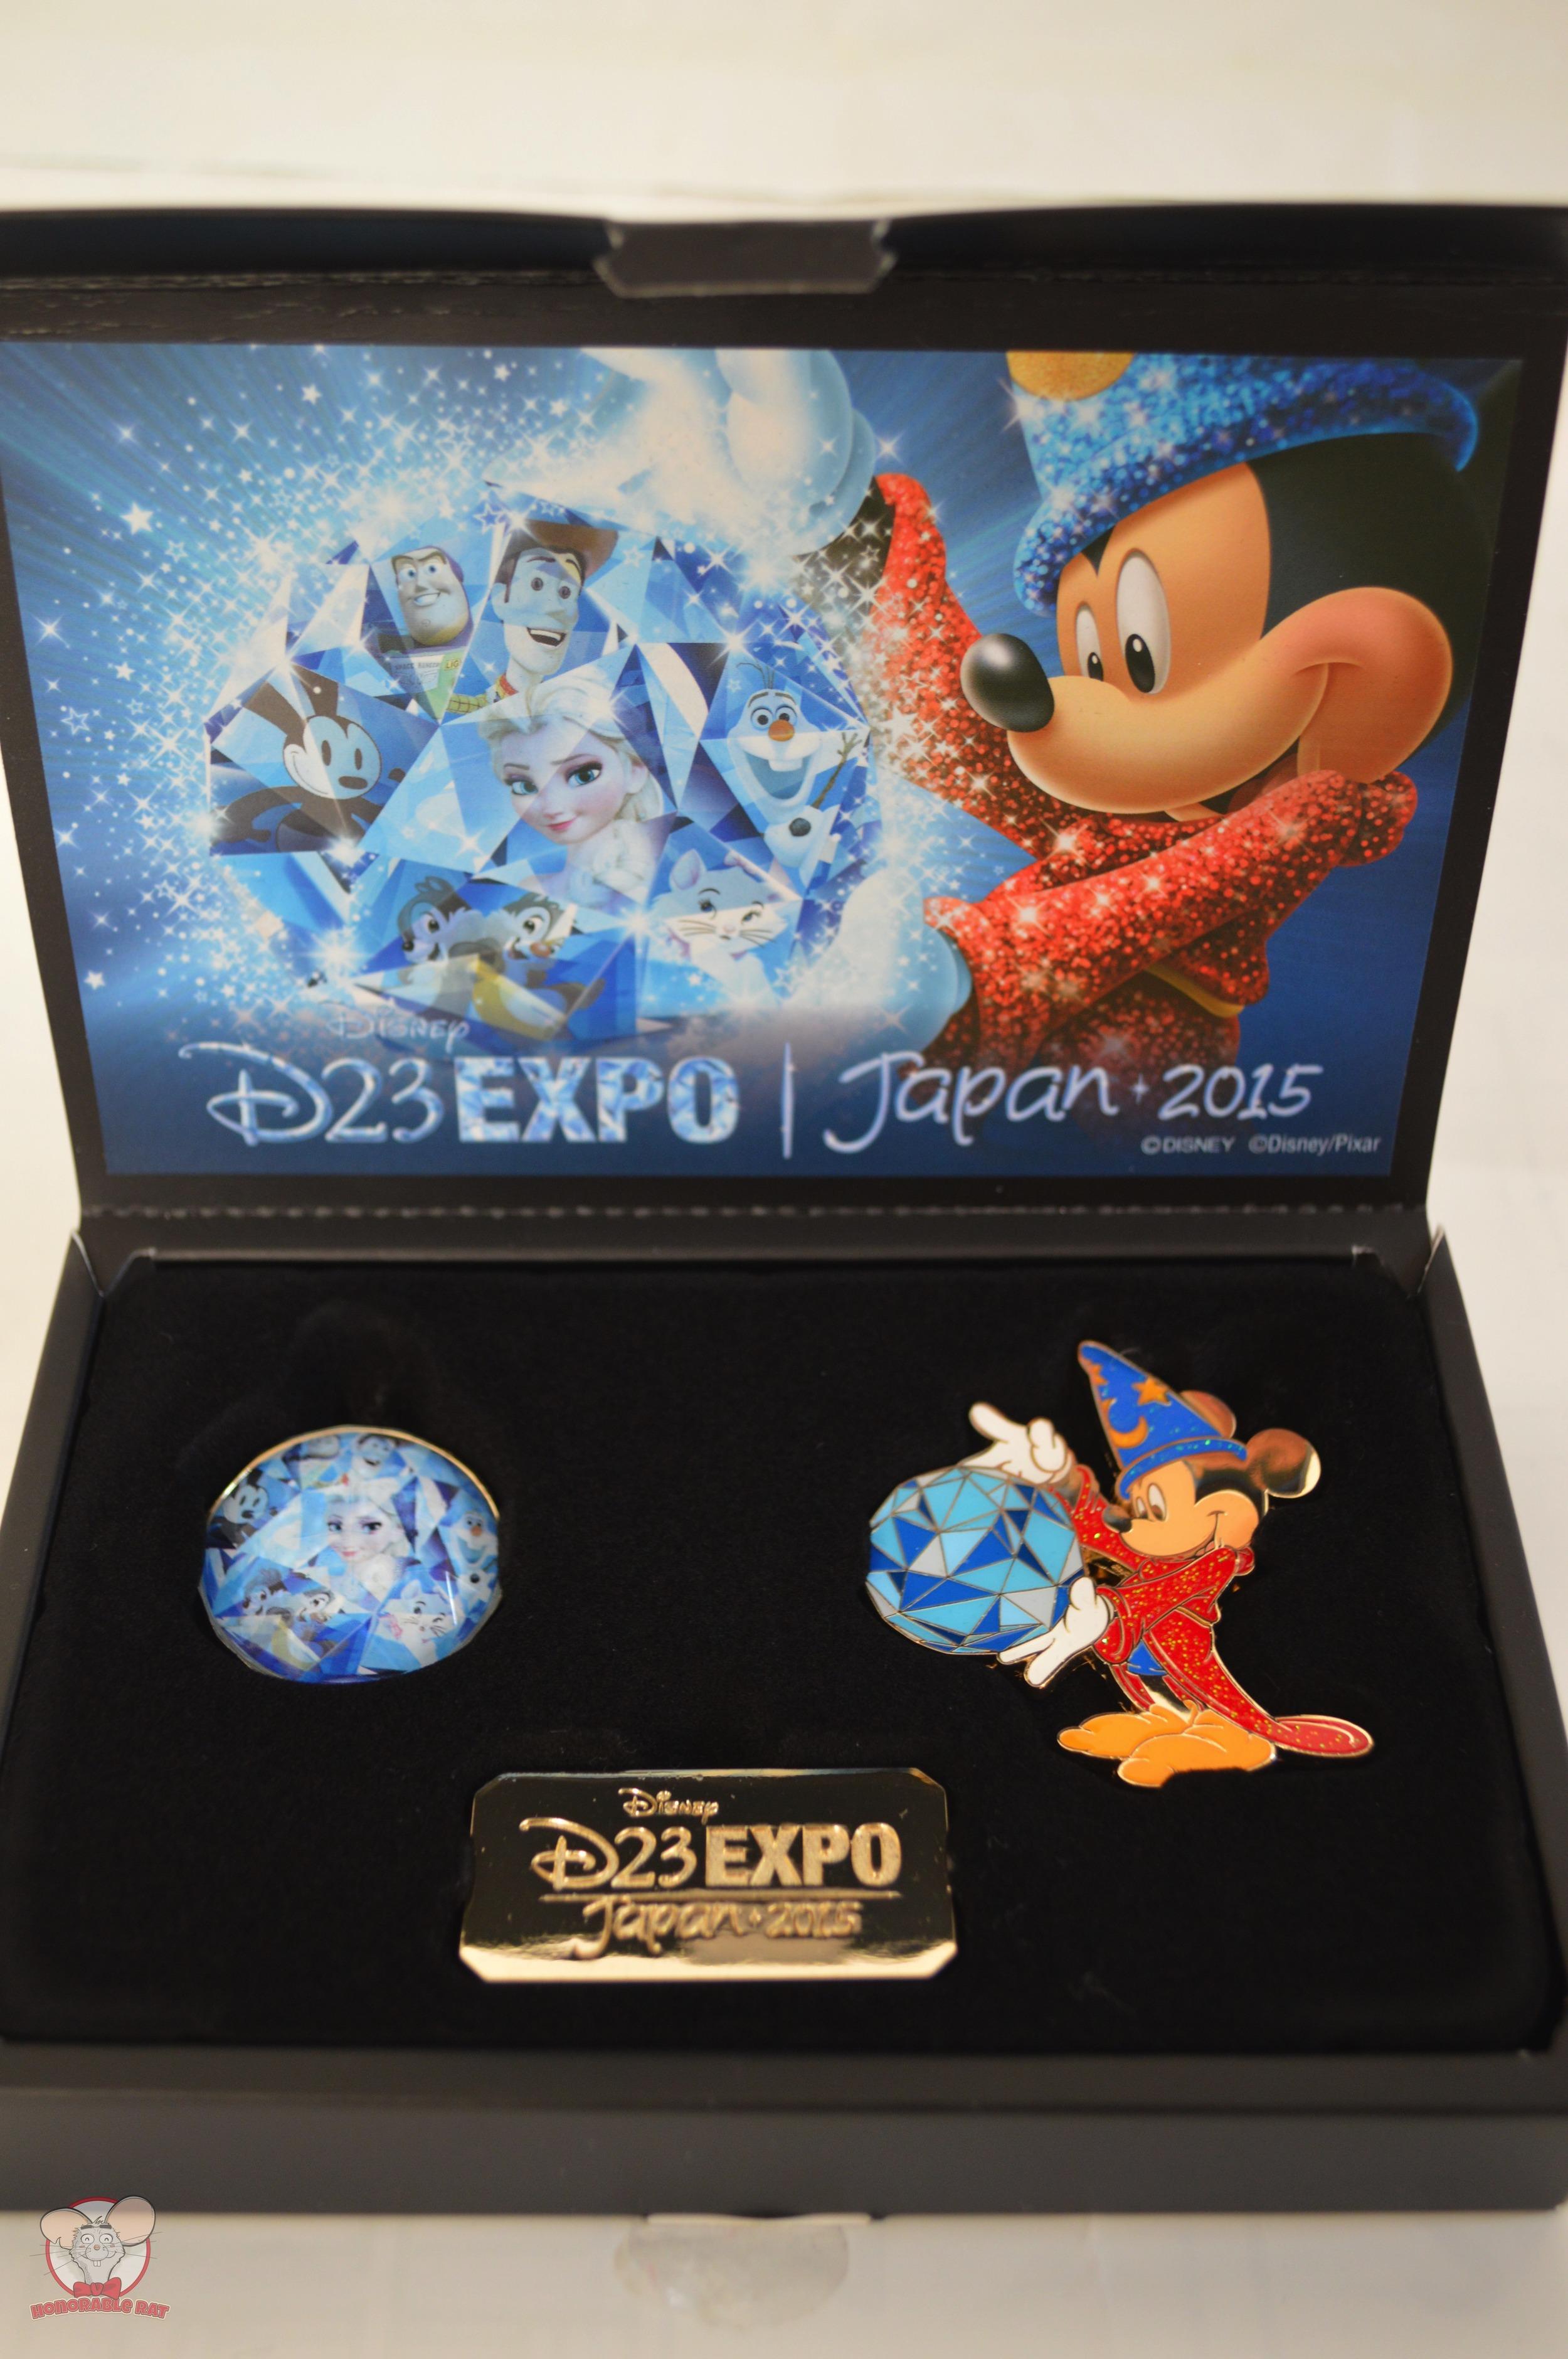 D23 Expo Japan 2015 Collectors Pin Set